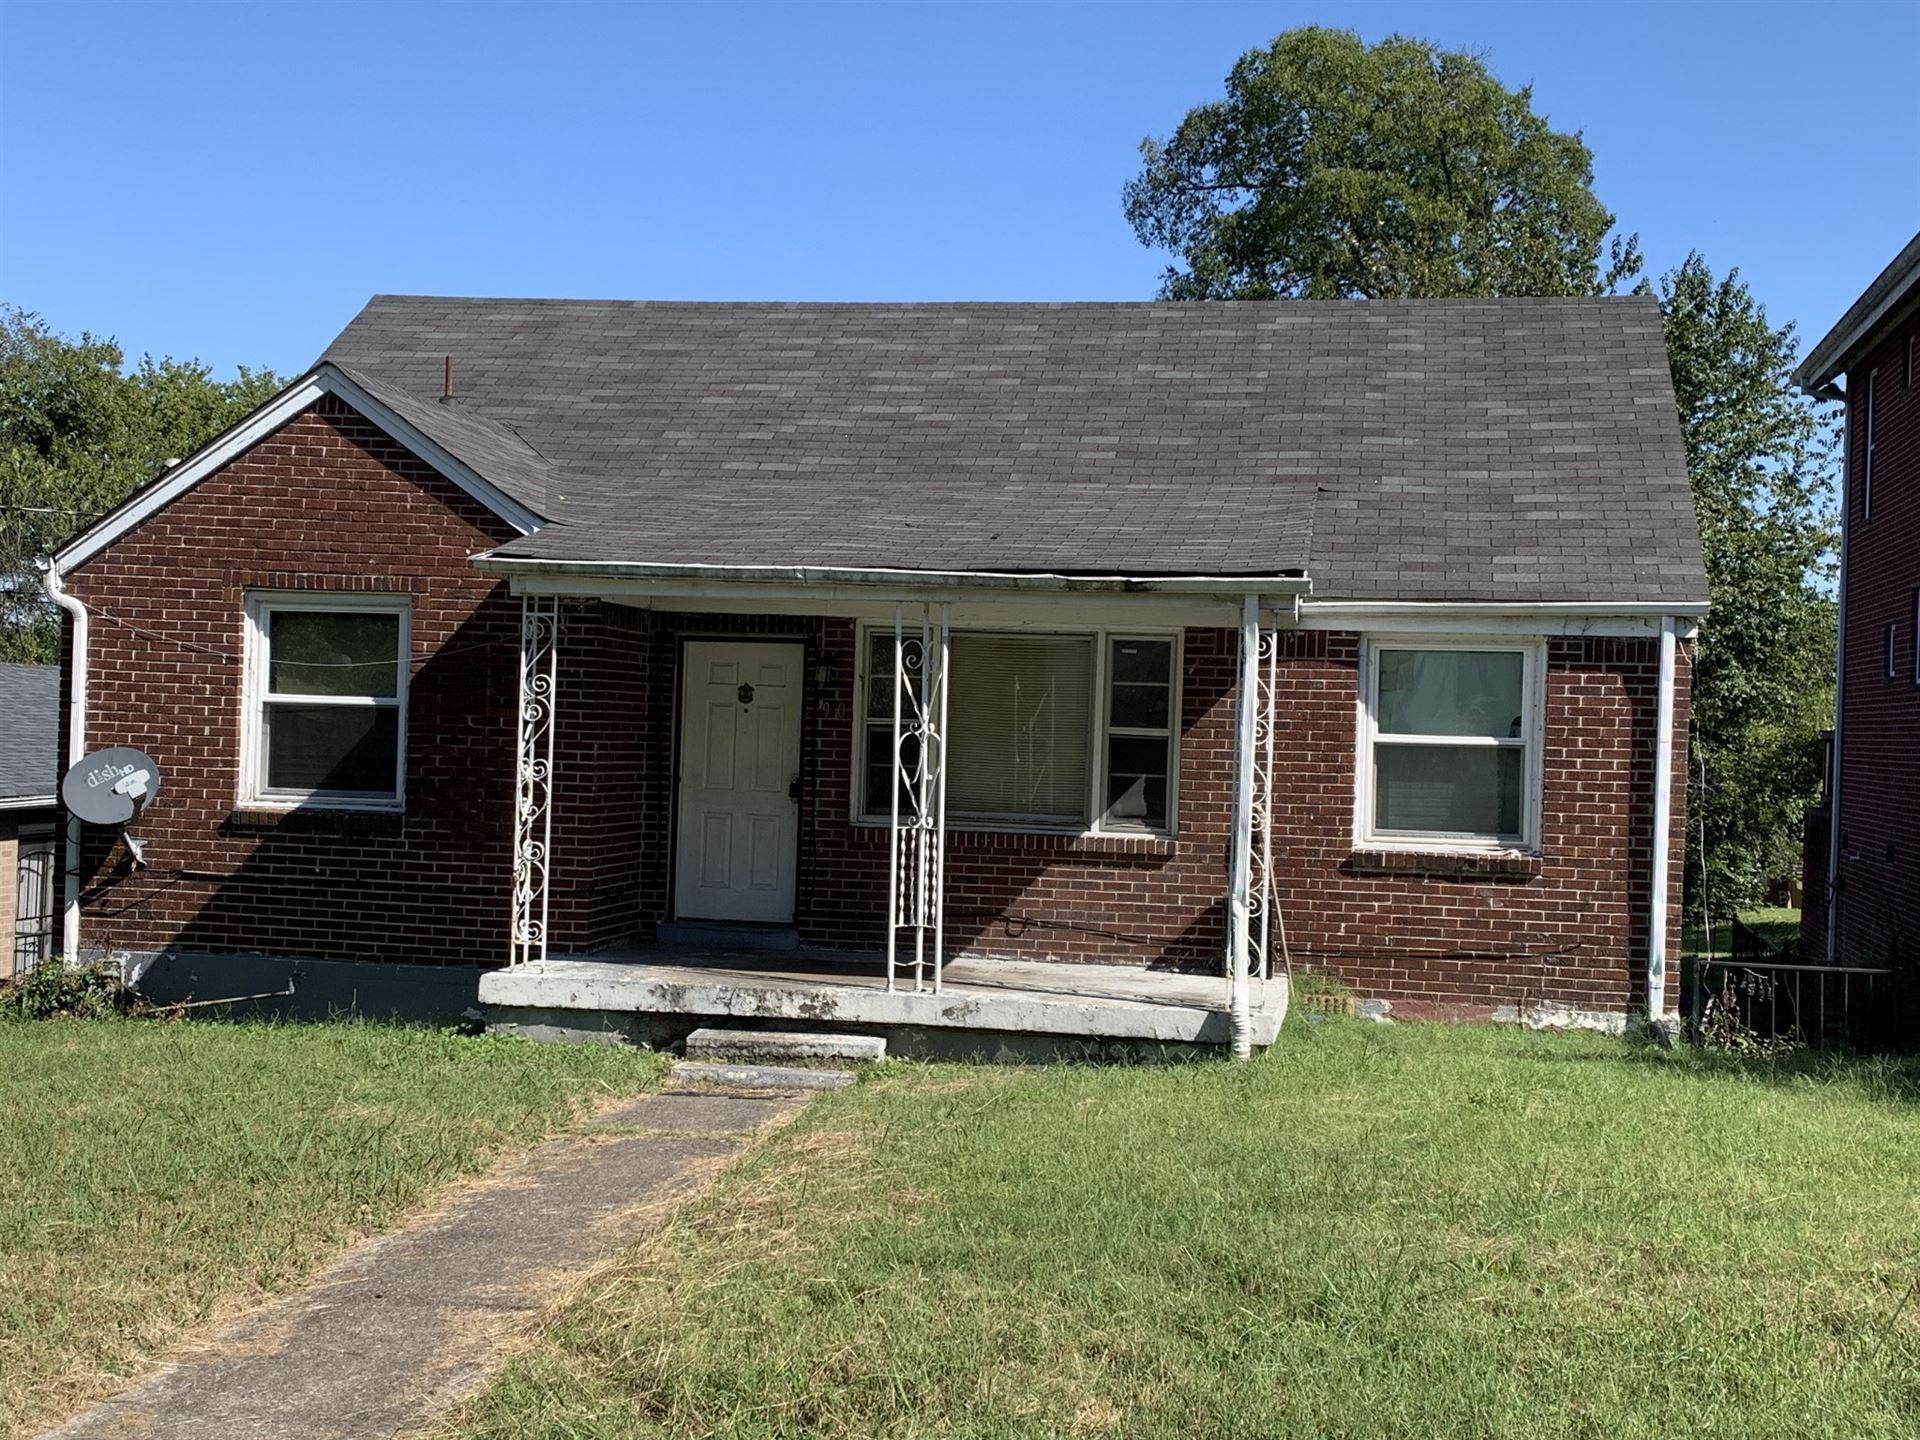 930 33rd Ave N, Nashville, TN 37209 - MLS#: 2301119